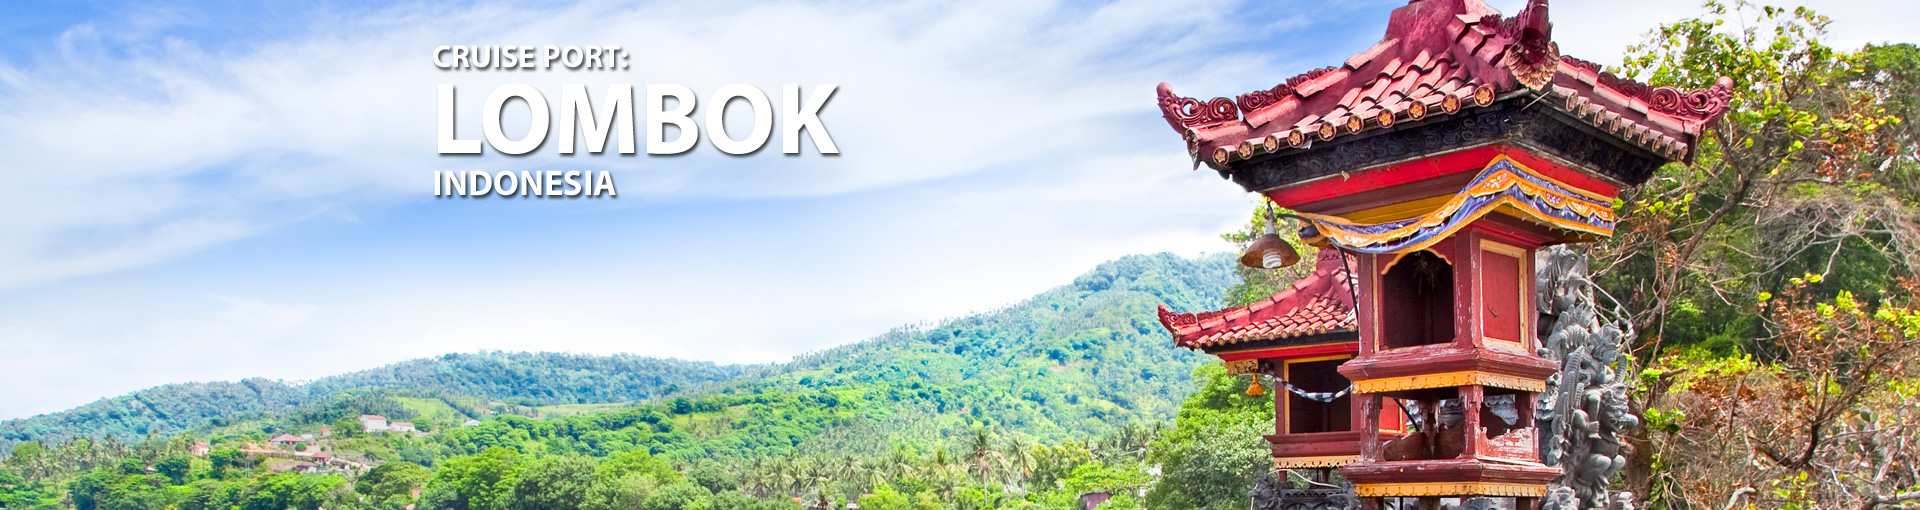 Cruises to Lombok, Indonesia